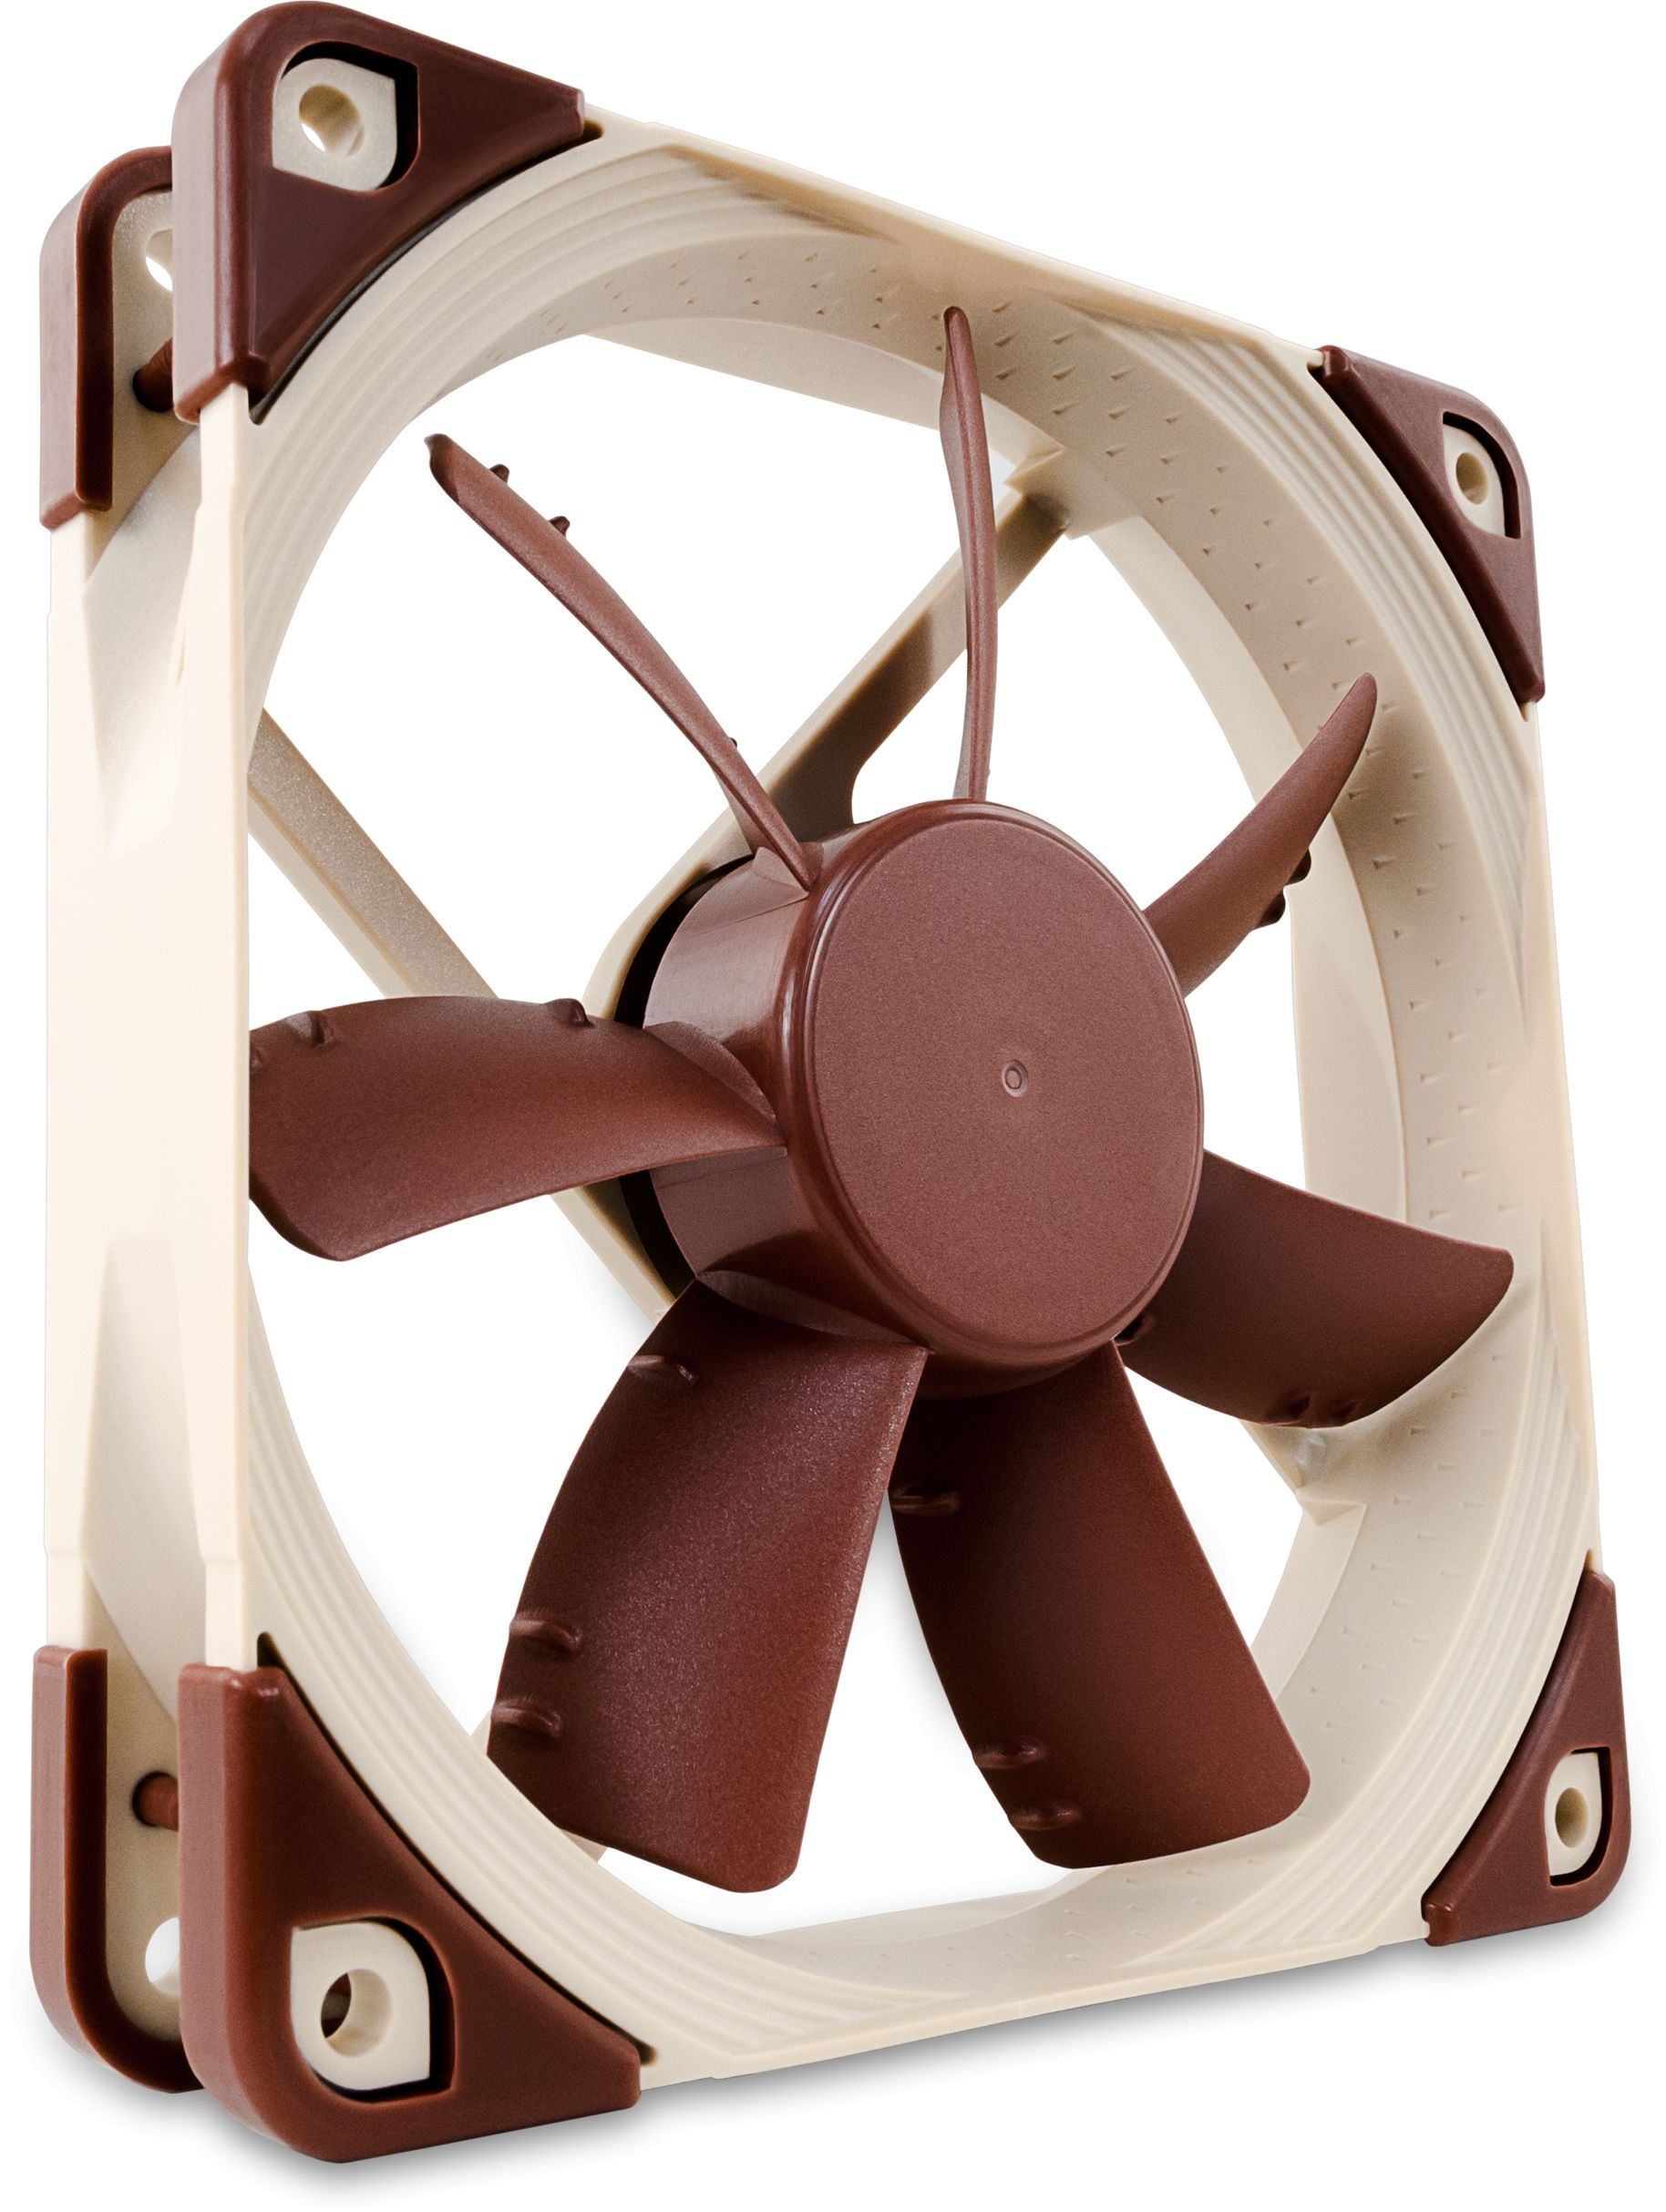 Nf S12a Uln Ultra Low Noise 120mm Cooling Fan 600 800 Rpm